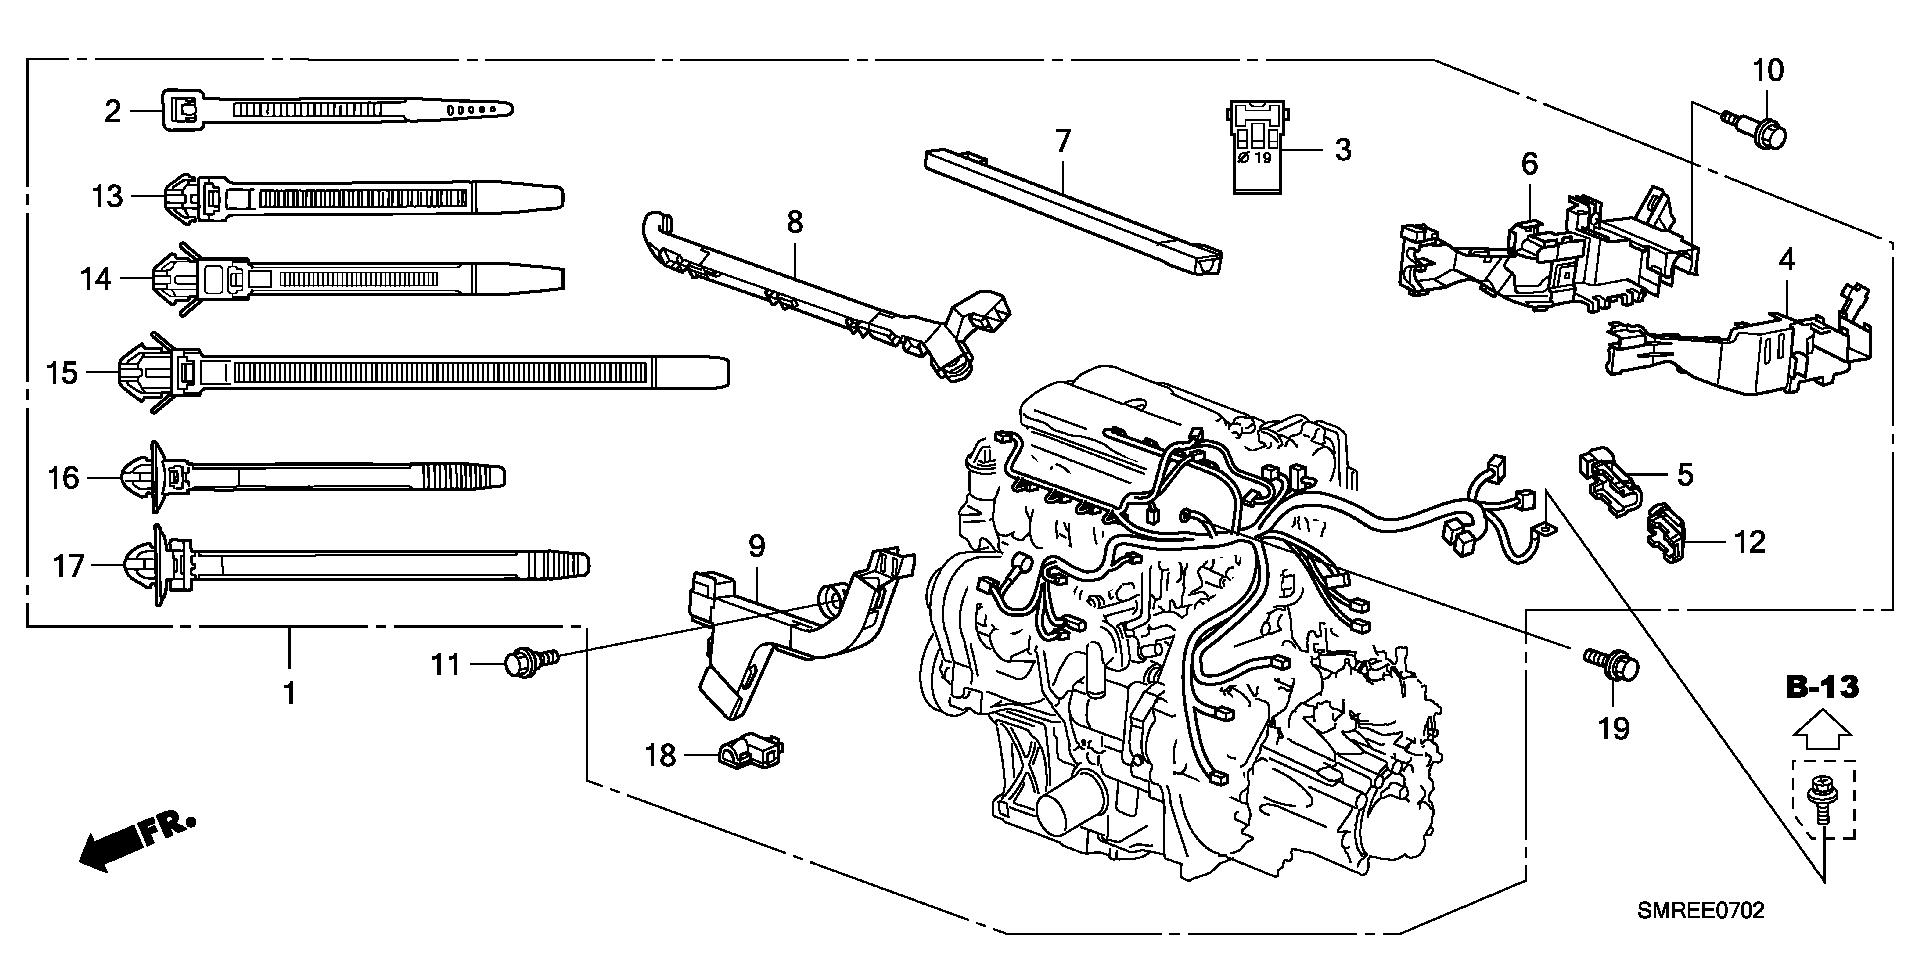 2010 Civic Kg6mt 14 Base E 7 2 Engine Wire Honda Wiring Harness